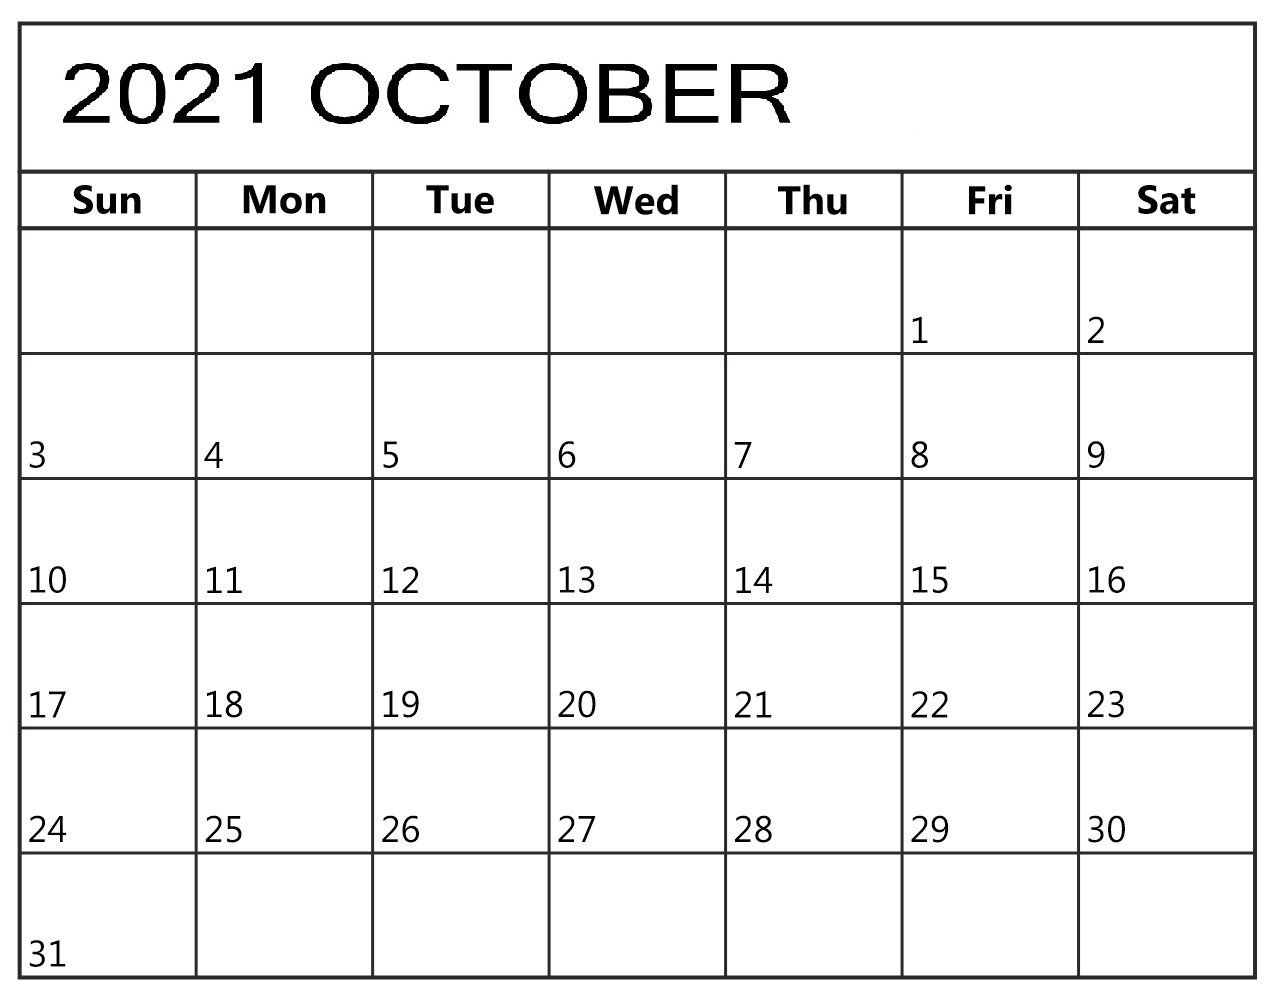 October 2021 Daily Calendar